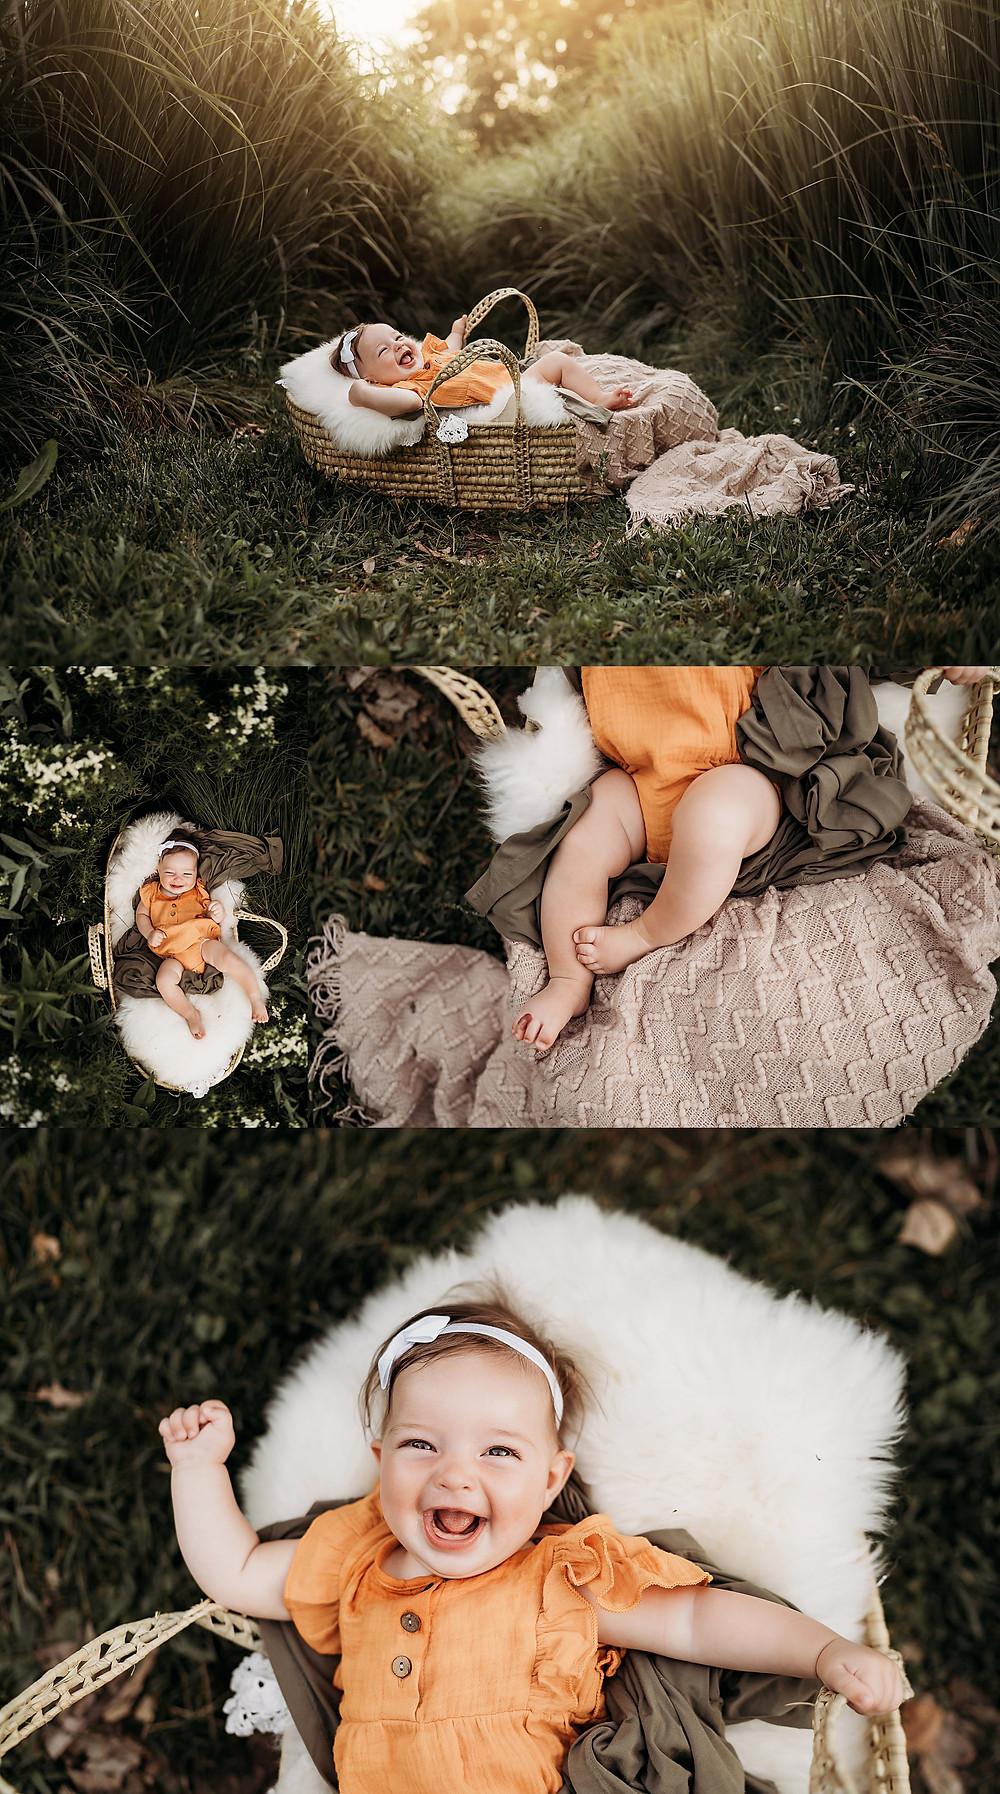 Indianapolis indiana Newborn pregnancy announcement Photographer, Alex Morris Design, dogs